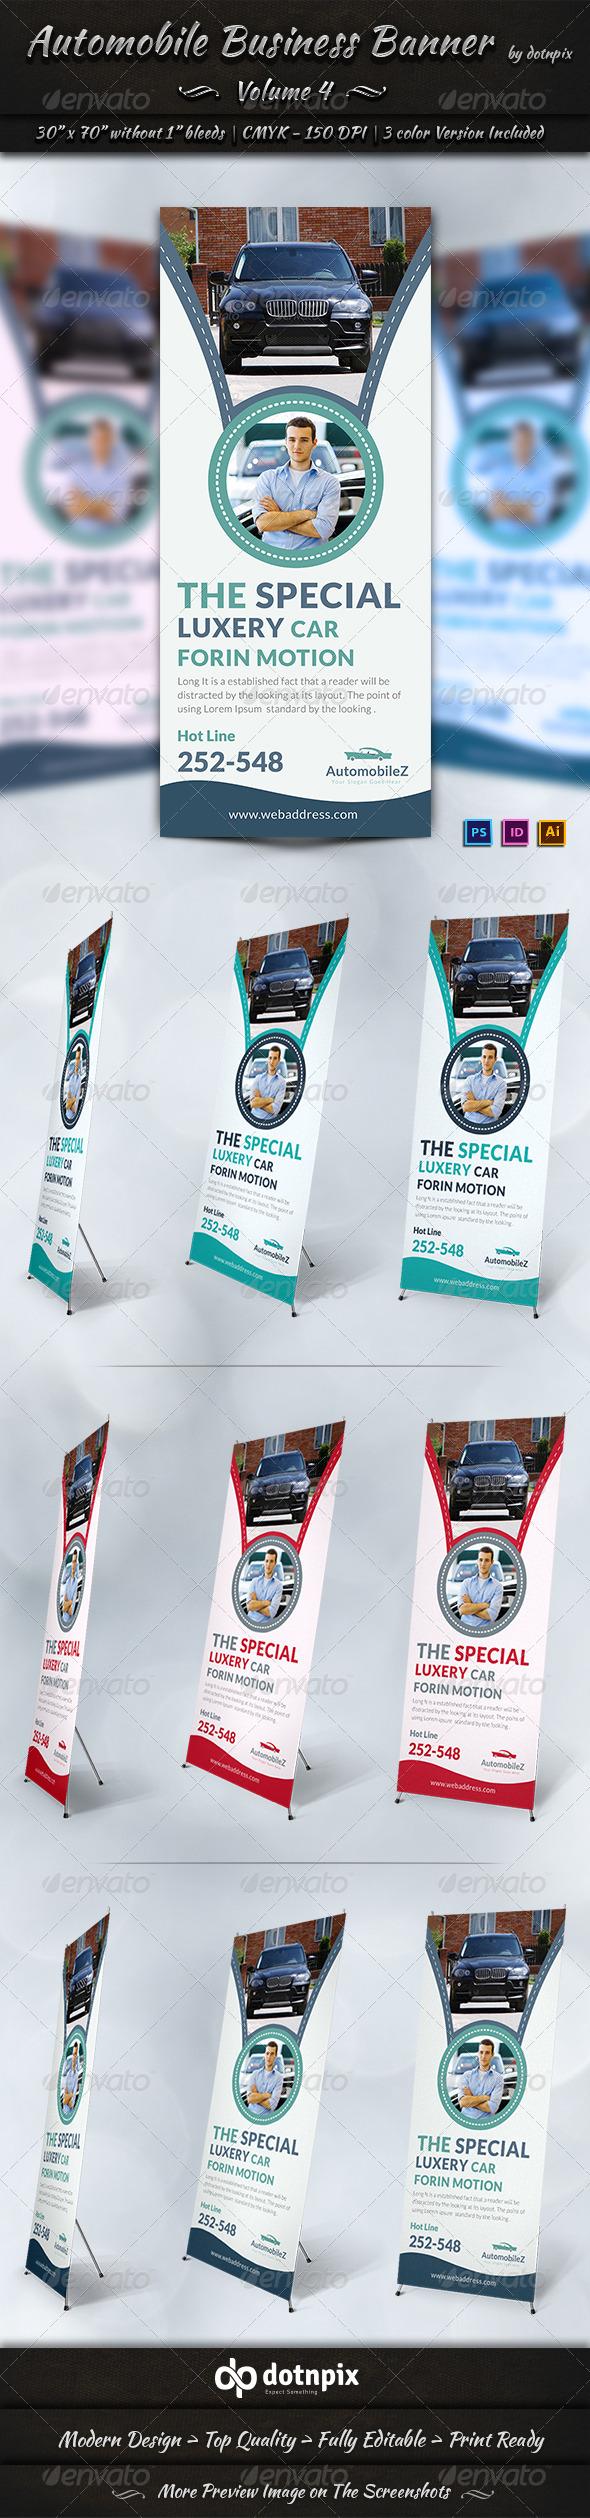 GraphicRiver Automobile Business Banner Volume 4 6920419